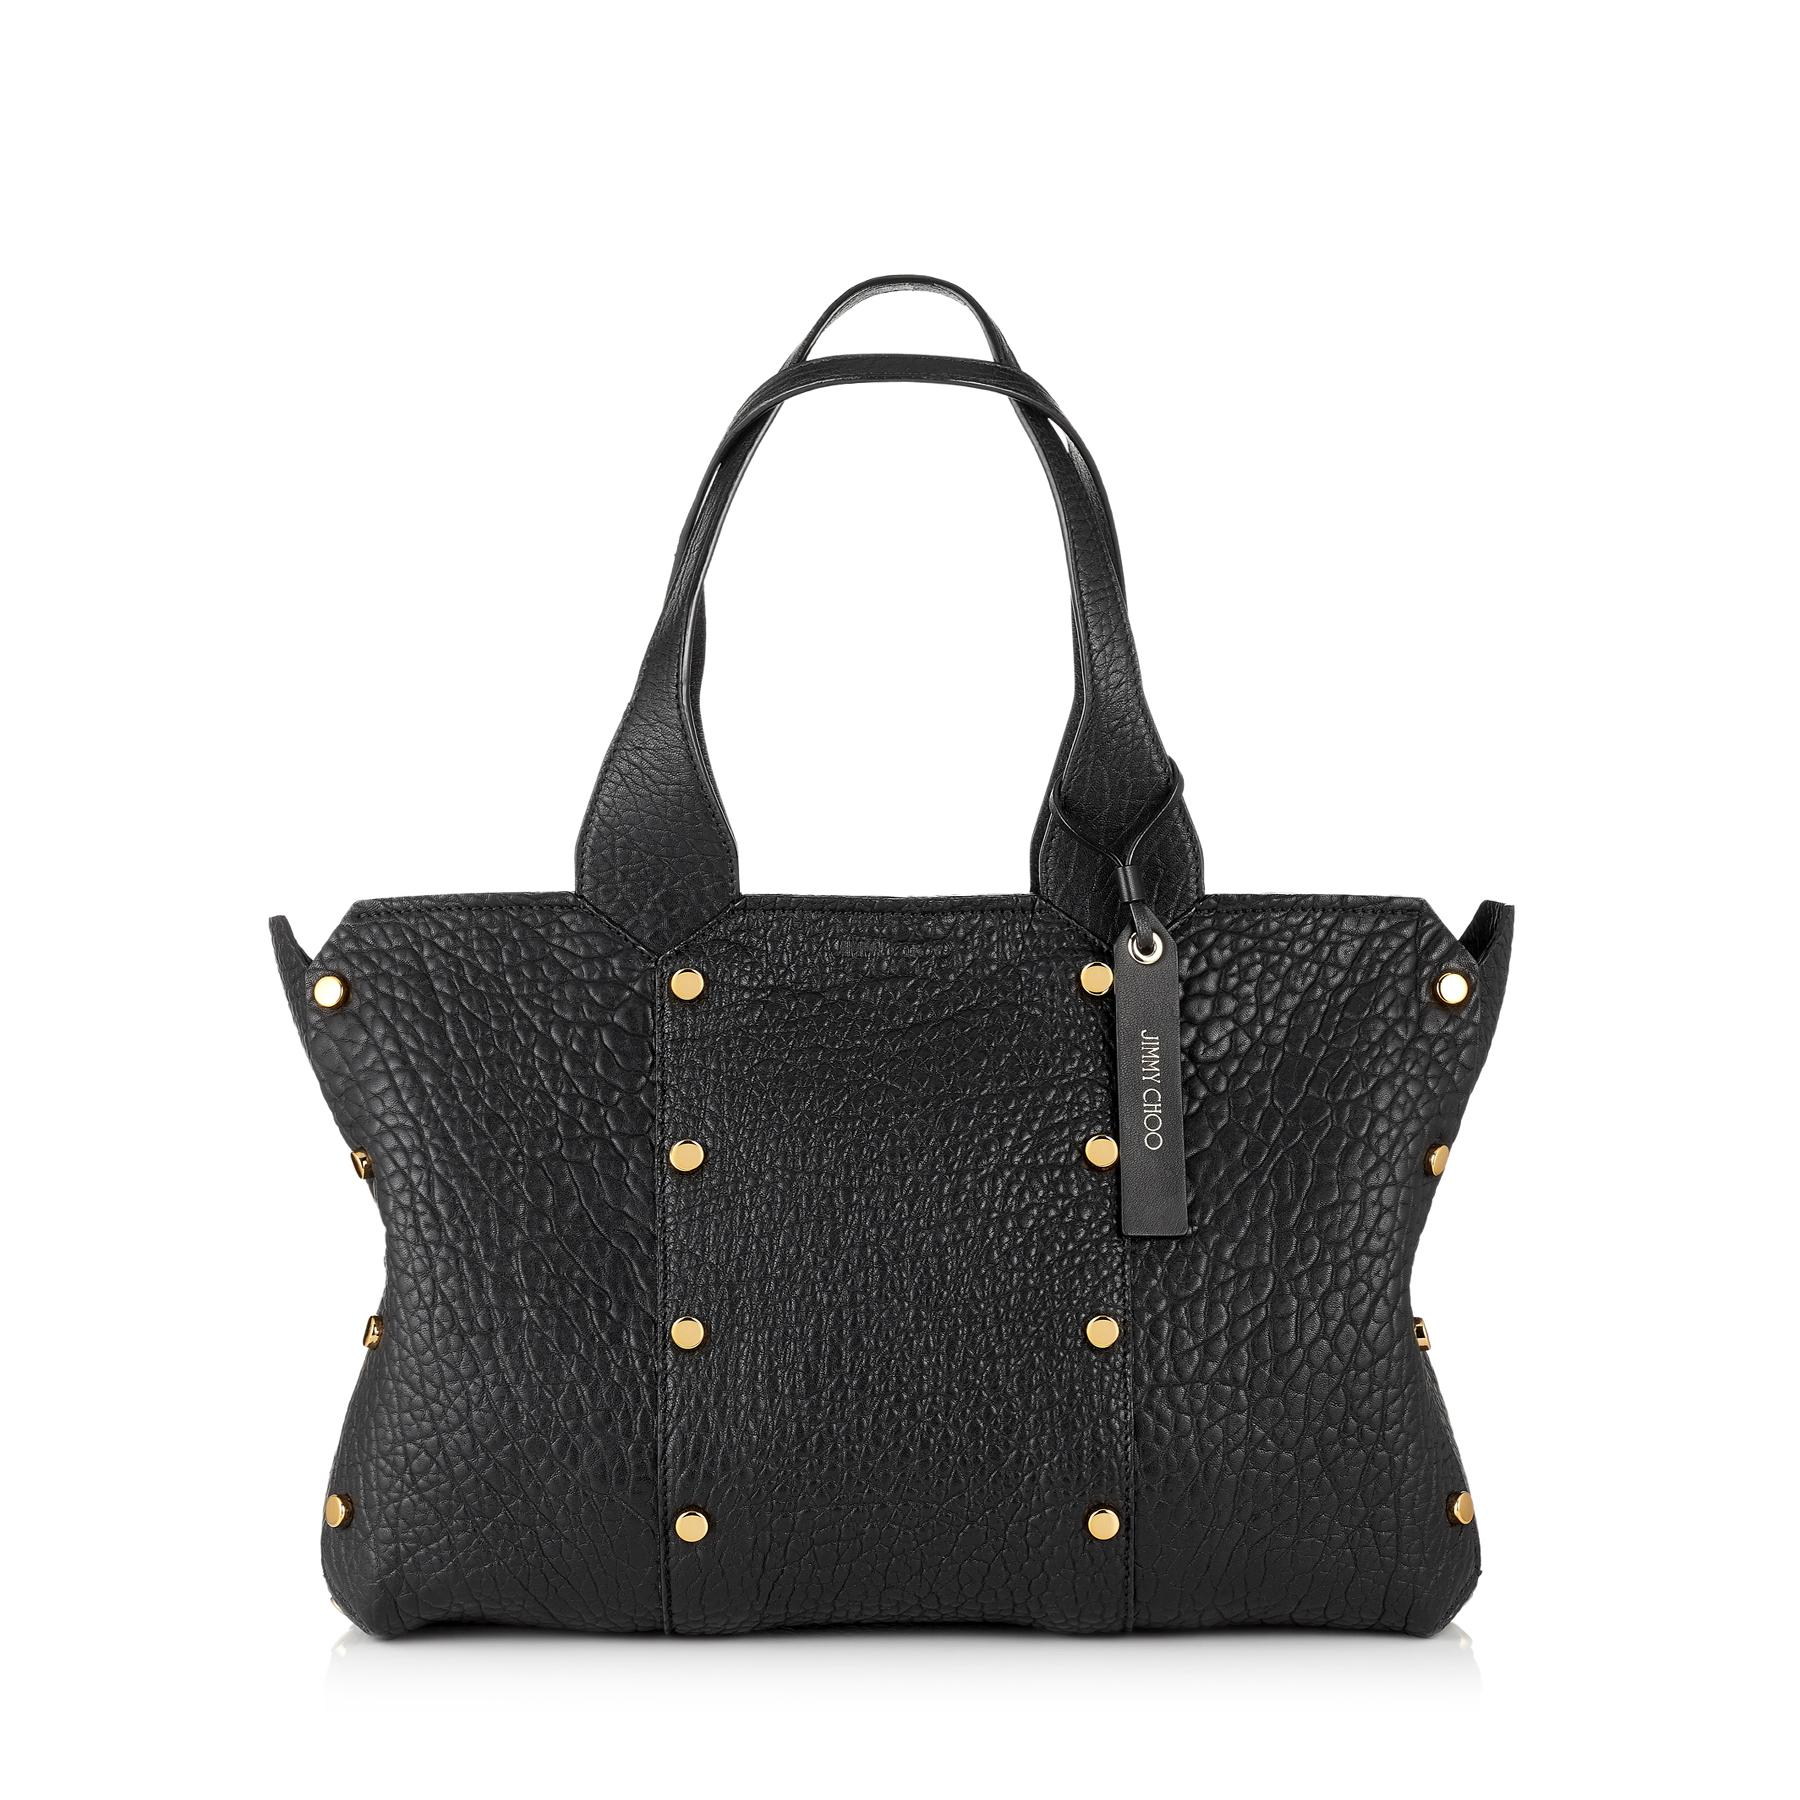 daa9df400b50 Lyst - Jimmy Choo Lockett Shopper s in Black